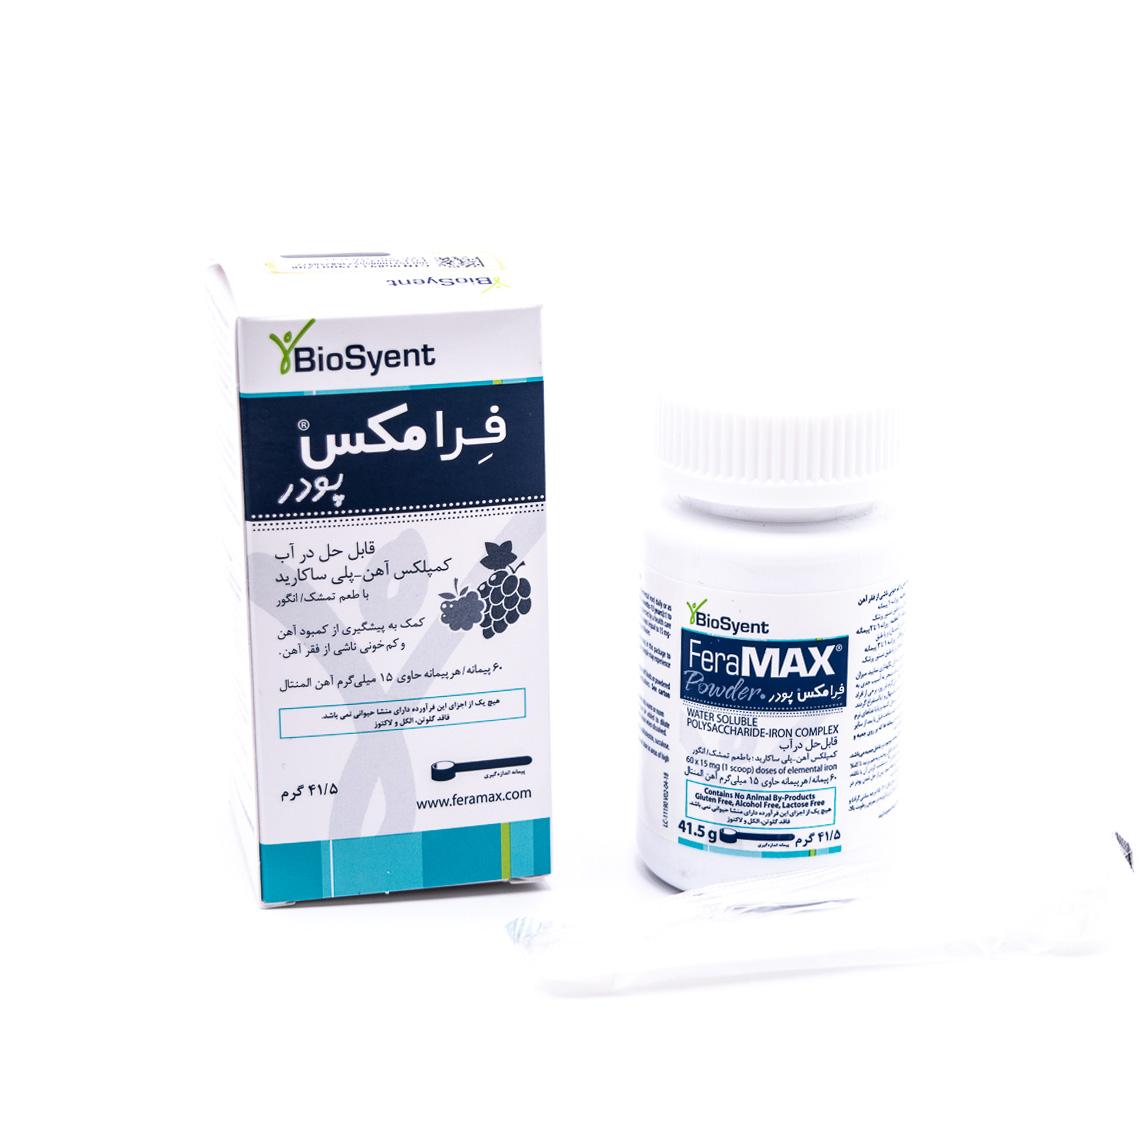 پودر کمپلکس آهن-پلی ساکارید فرامکس 41.5 گرم Feramax